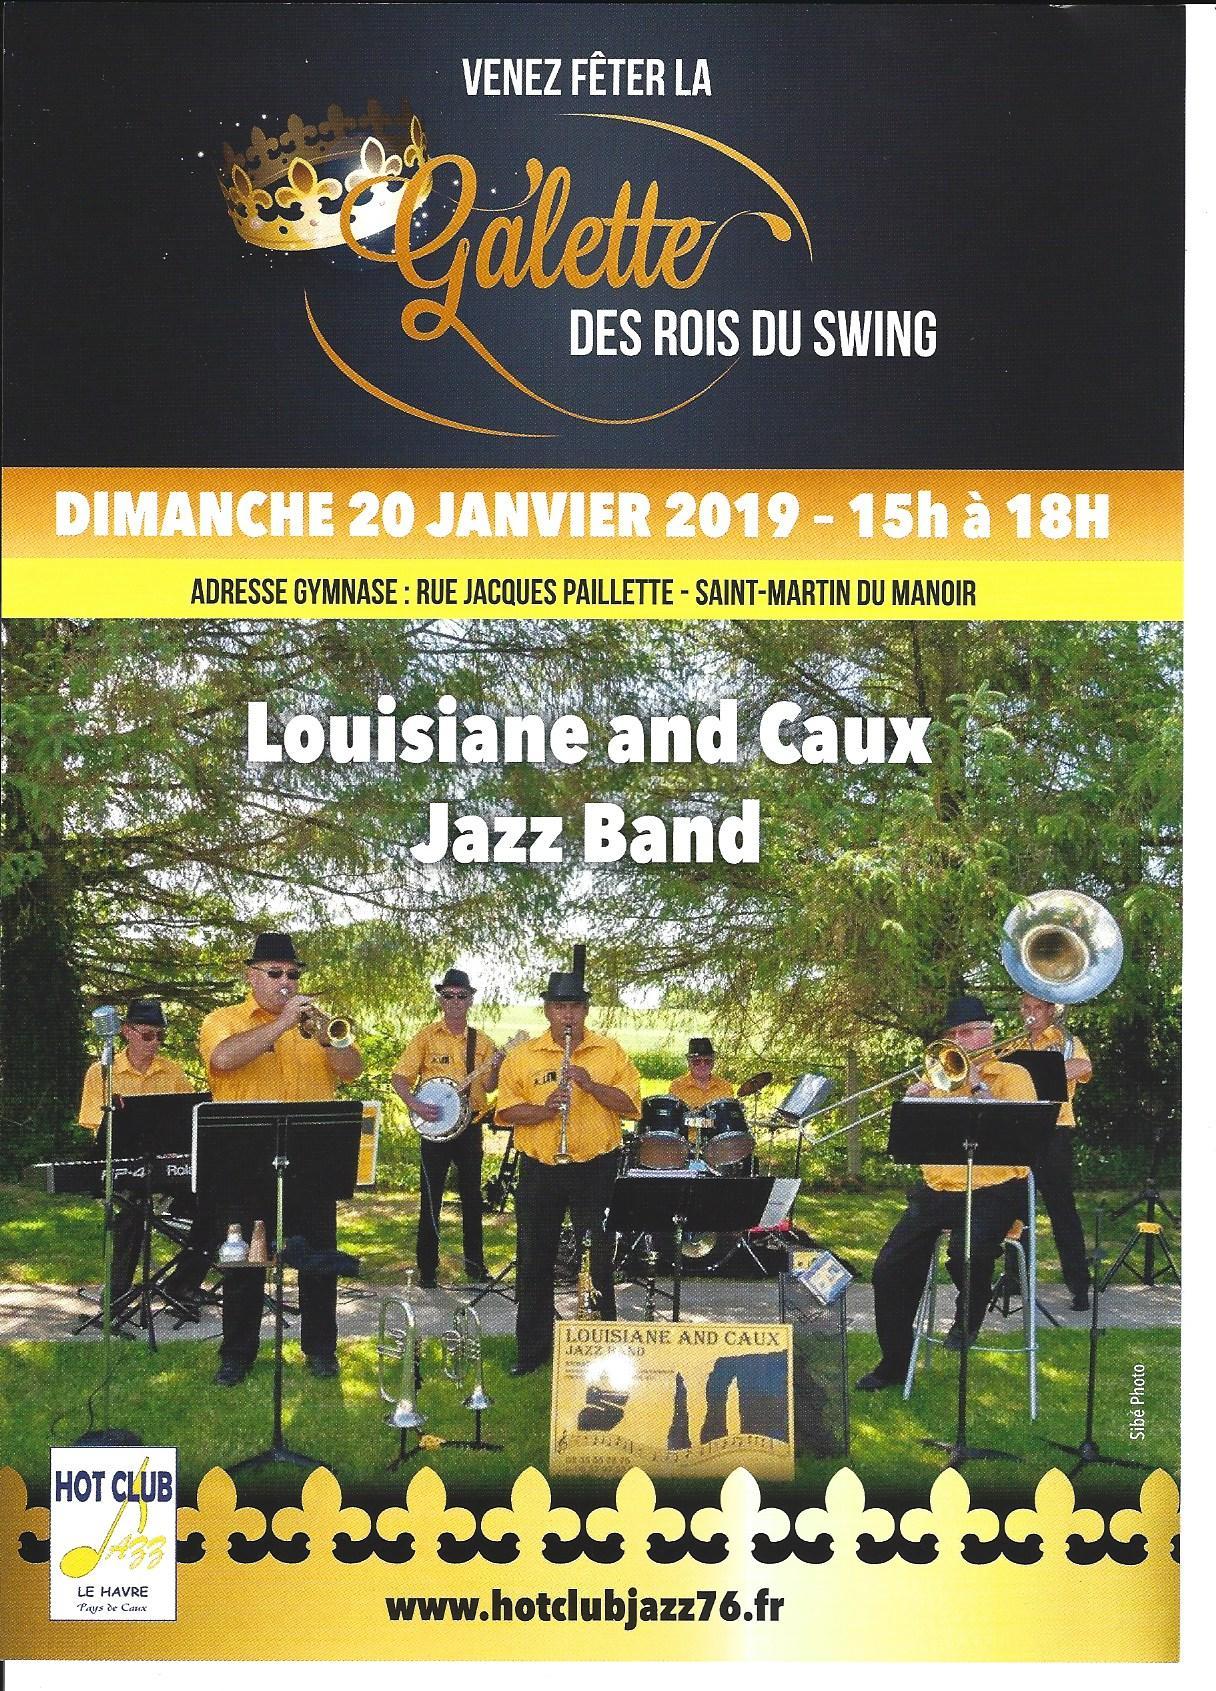 Flyer galette des rois hot club 20 01 19 verso